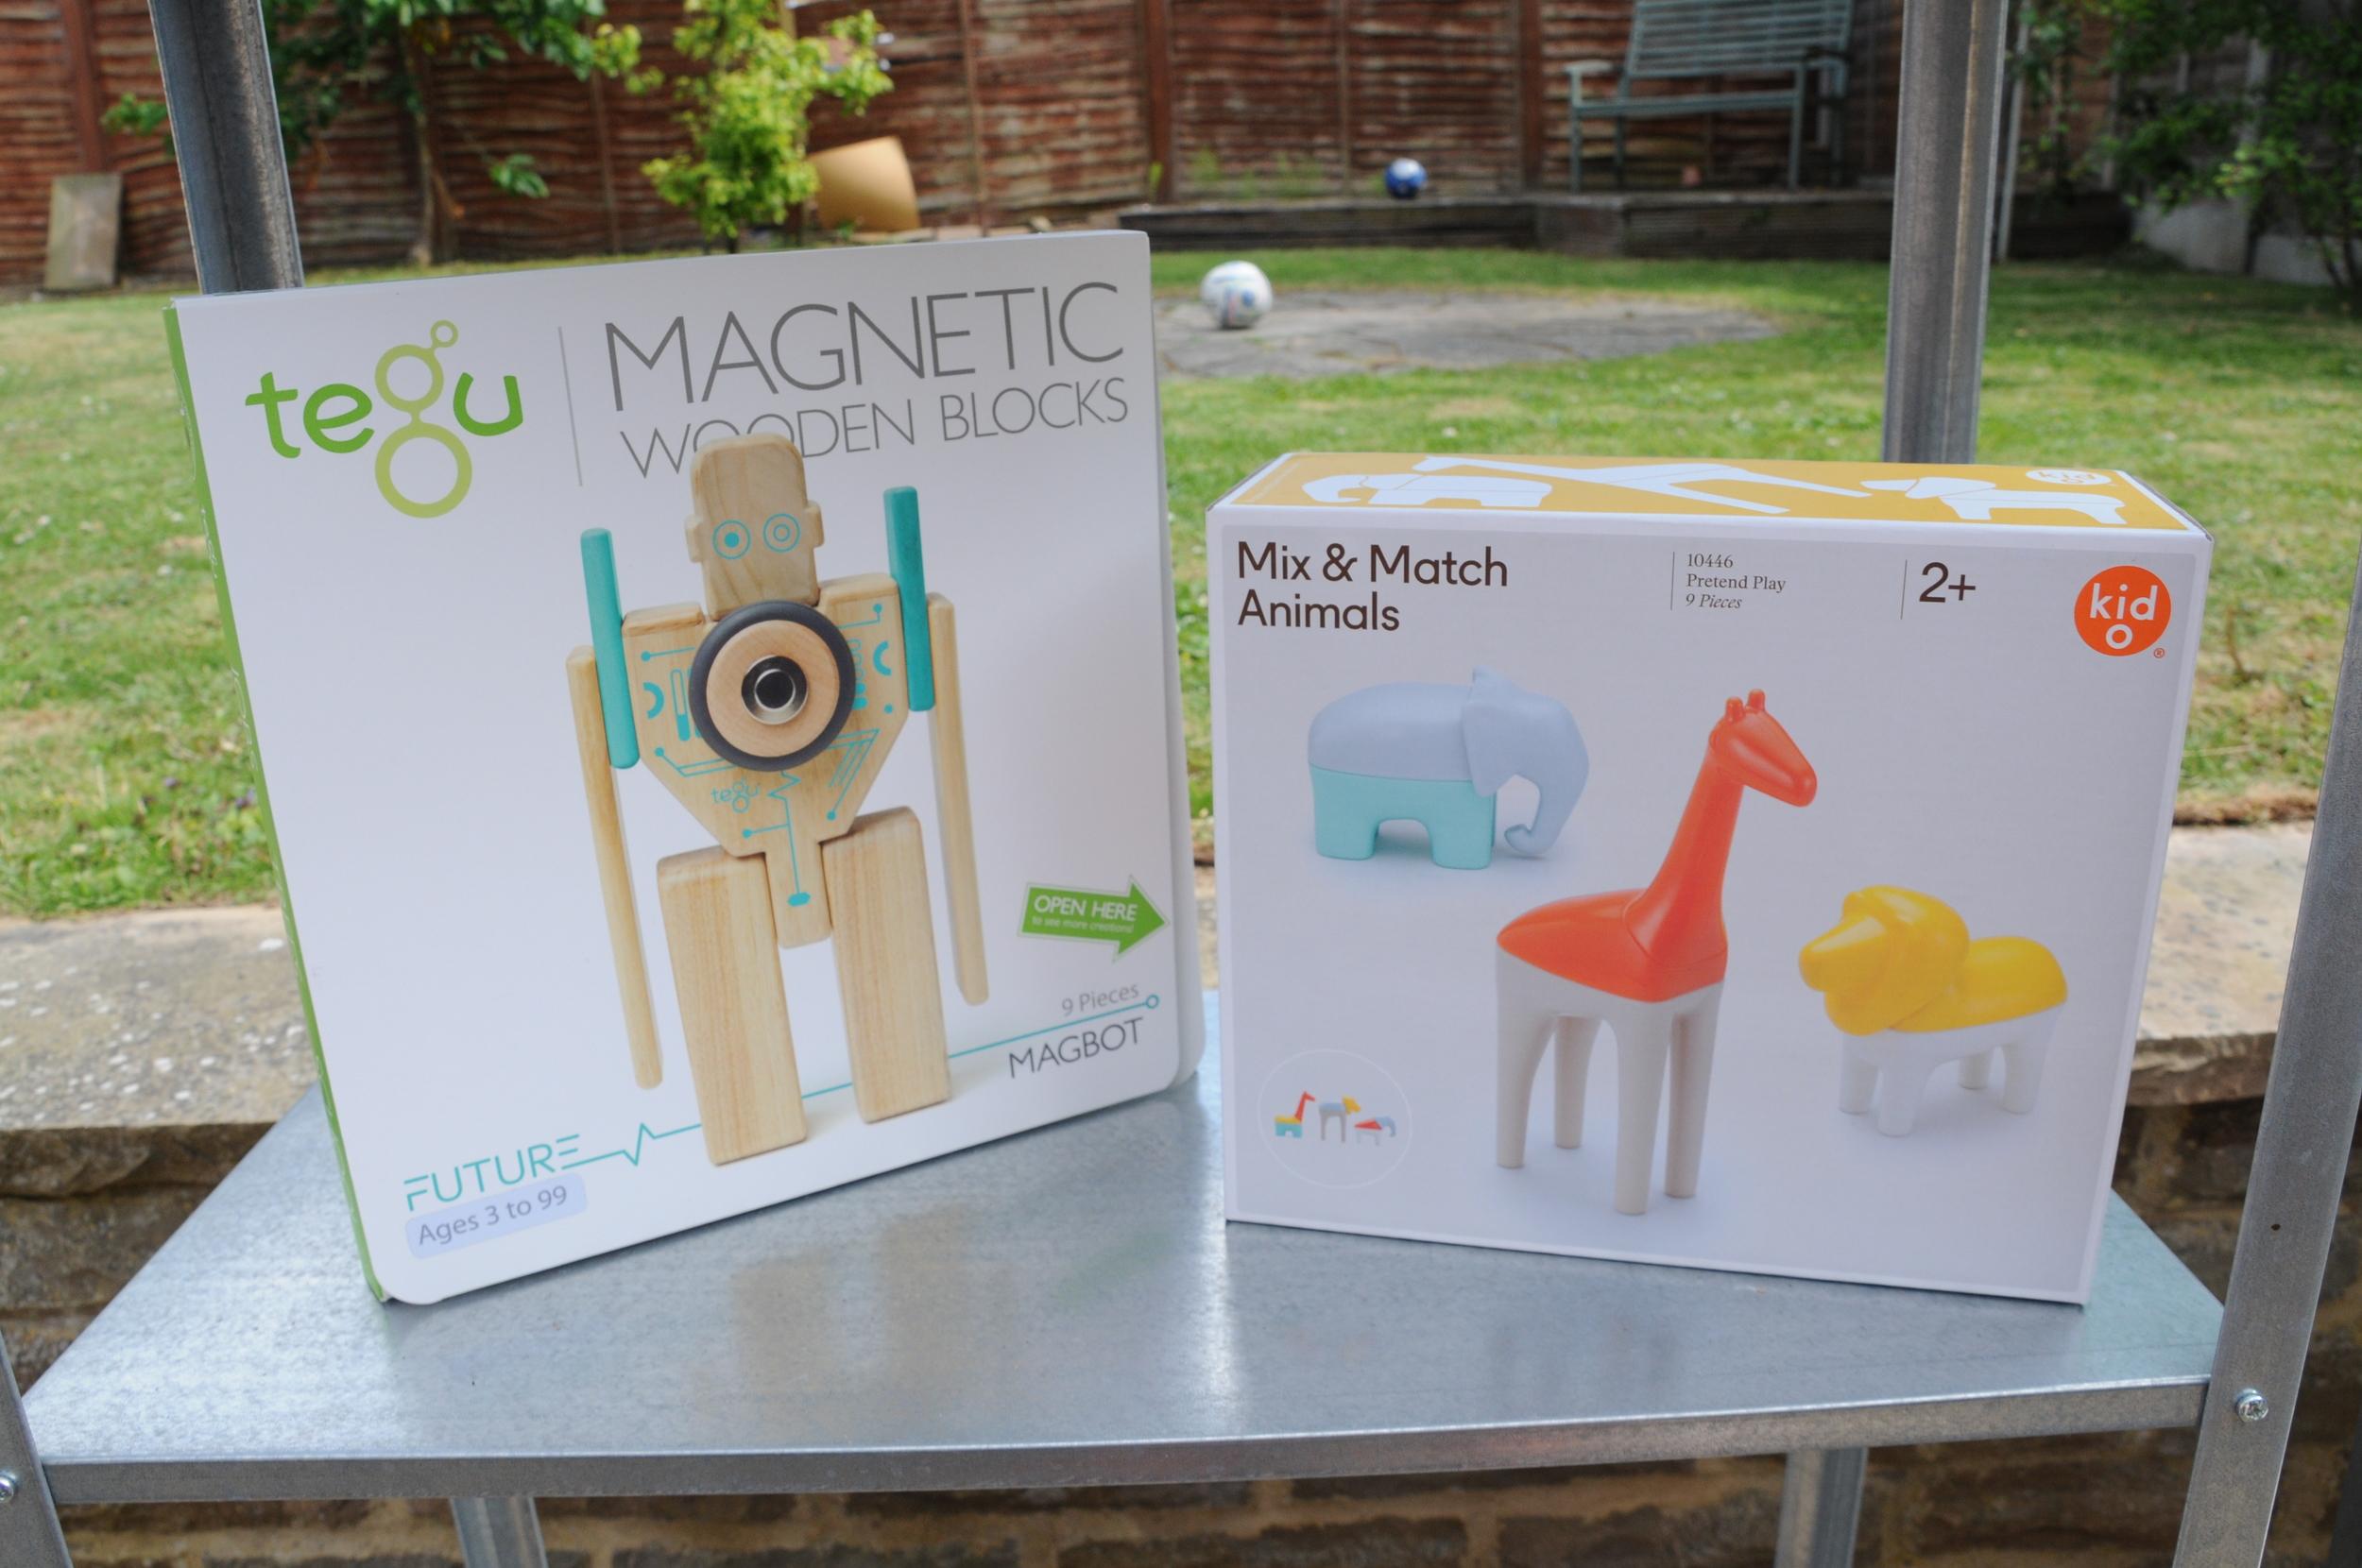 Tegu magnetic wooden blocks £23.99  Toyella . Kid O Mix and Match Animals £23.99  Toyella